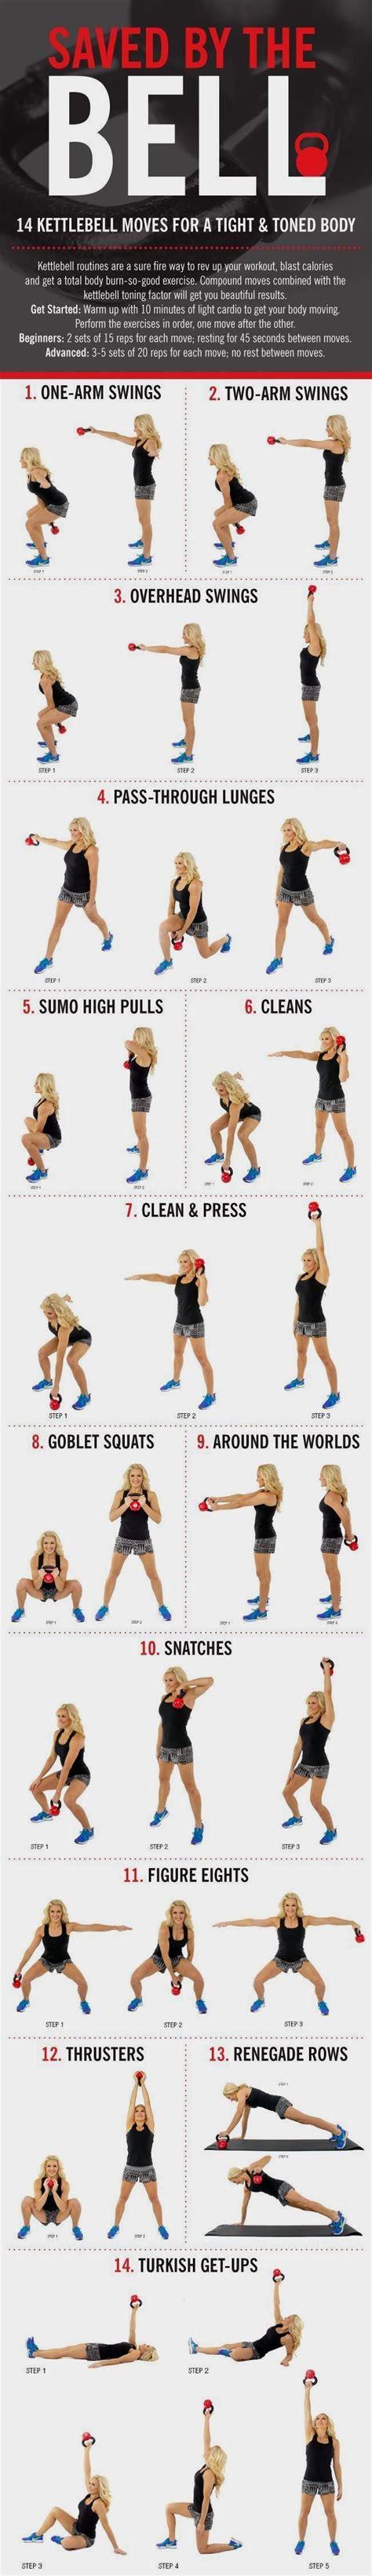 sportspersonaltrainer kettlebell body workout workouts